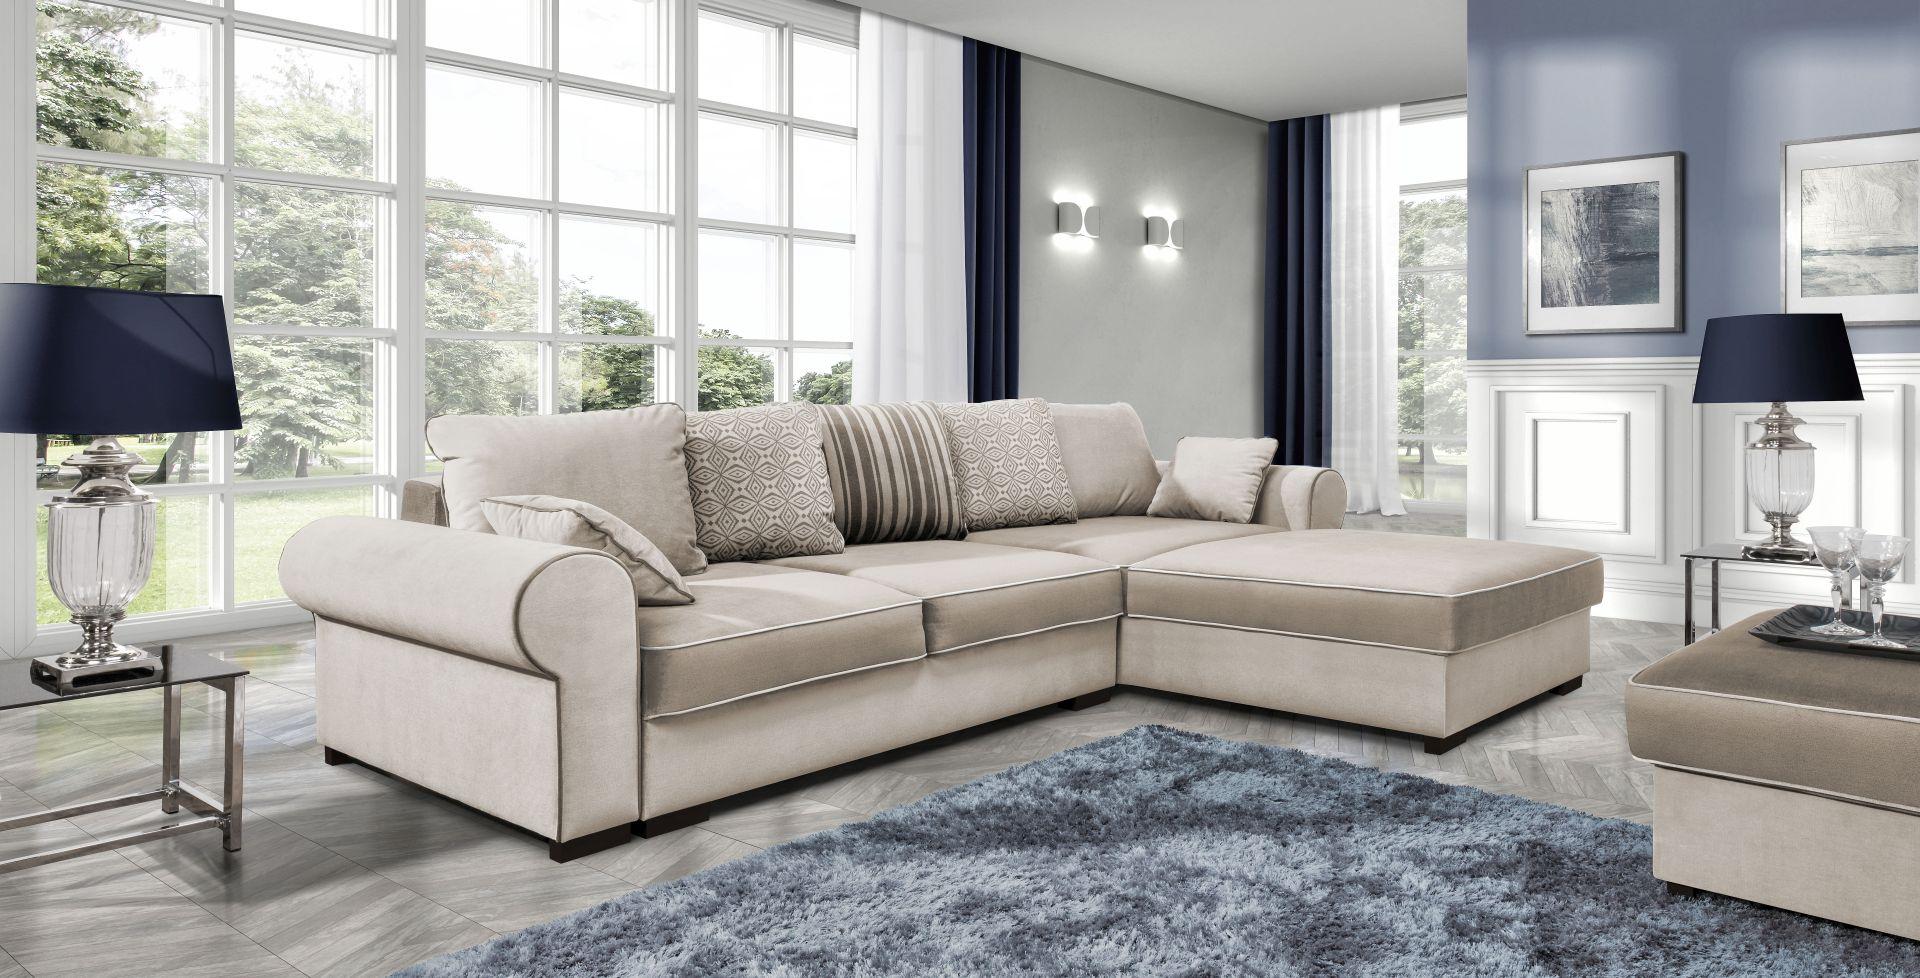 sofa schlafsofa designer sofa mit bettfunktion bettkasten ecksofa couch neu deluxe corner. Black Bedroom Furniture Sets. Home Design Ideas